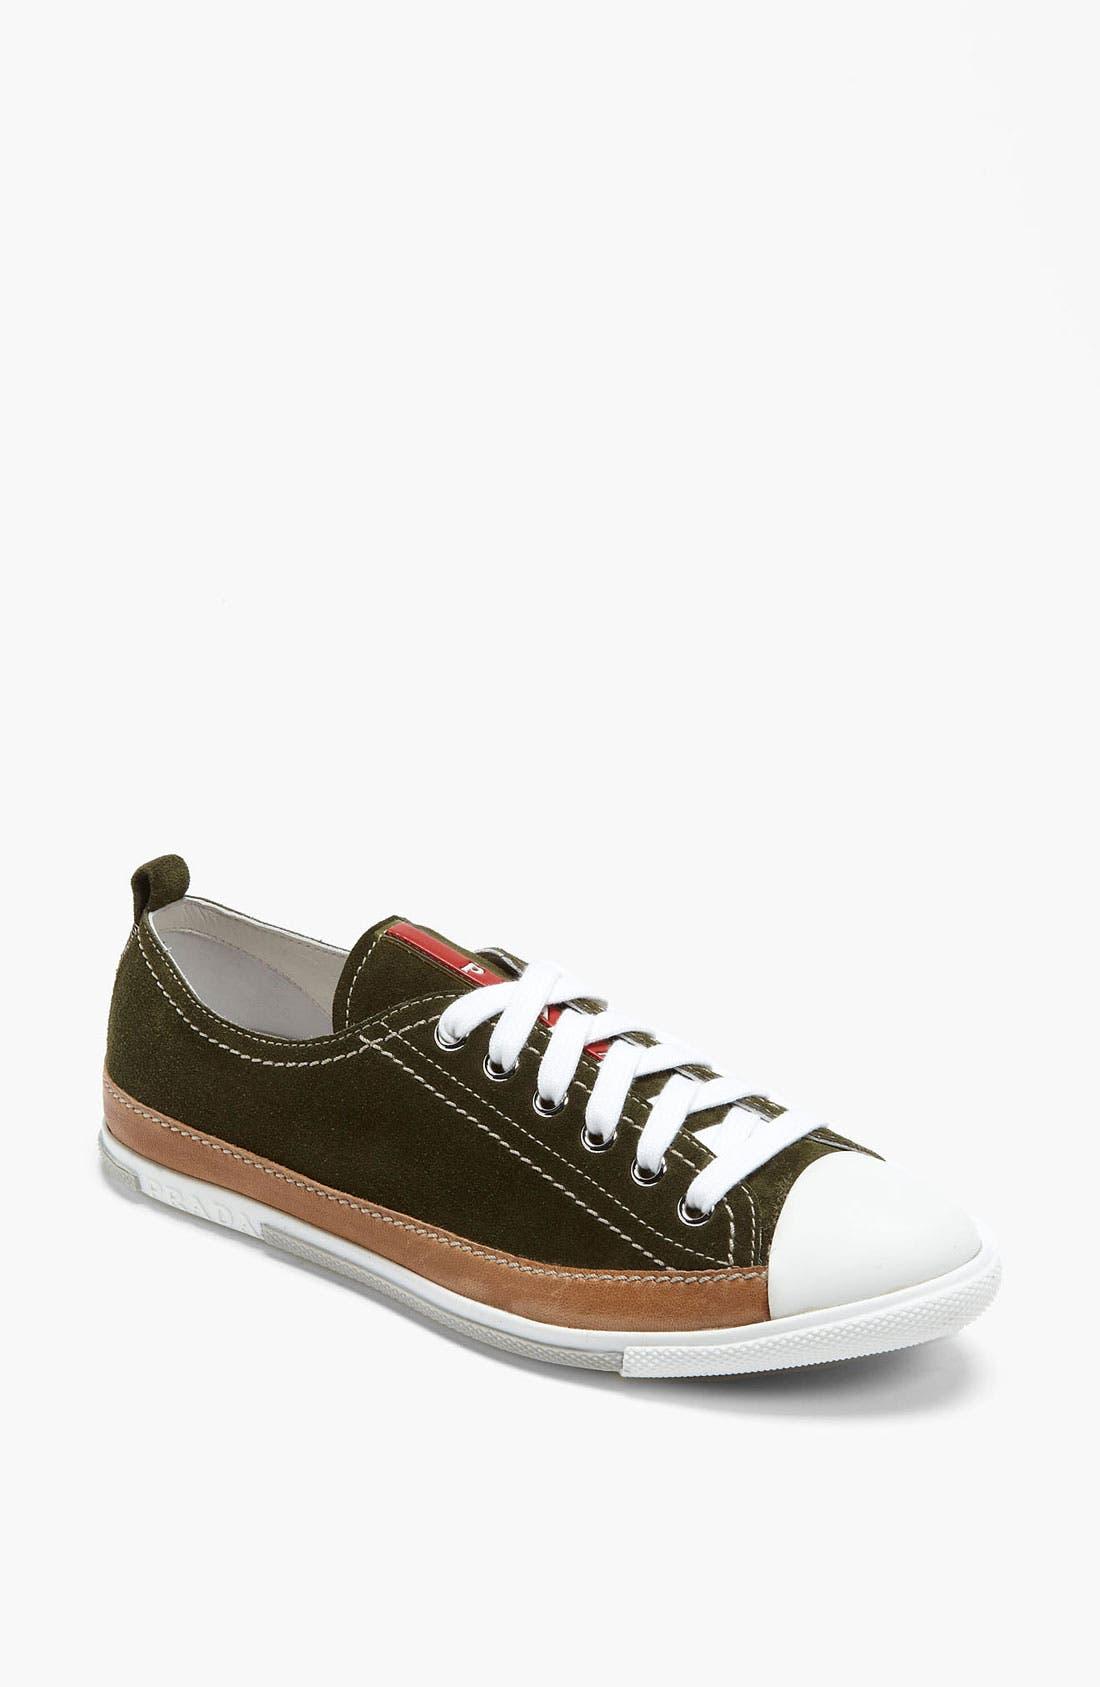 Alternate Image 1 Selected - Prada Suede Sneaker